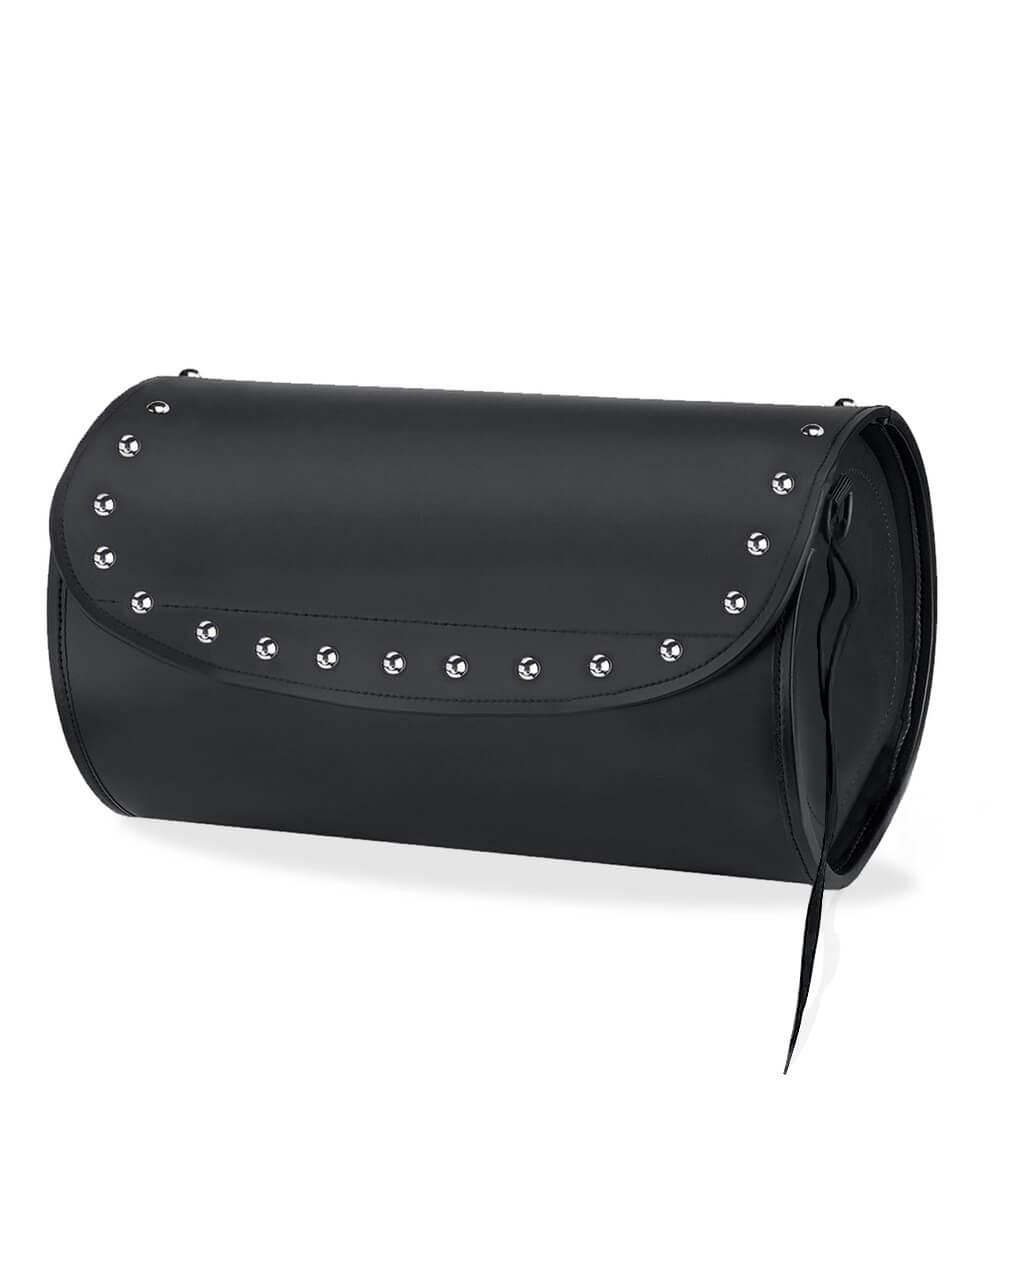 Victory Viking Revival Series Studded Motorcycle Sissy Bar Bag Roll Bag